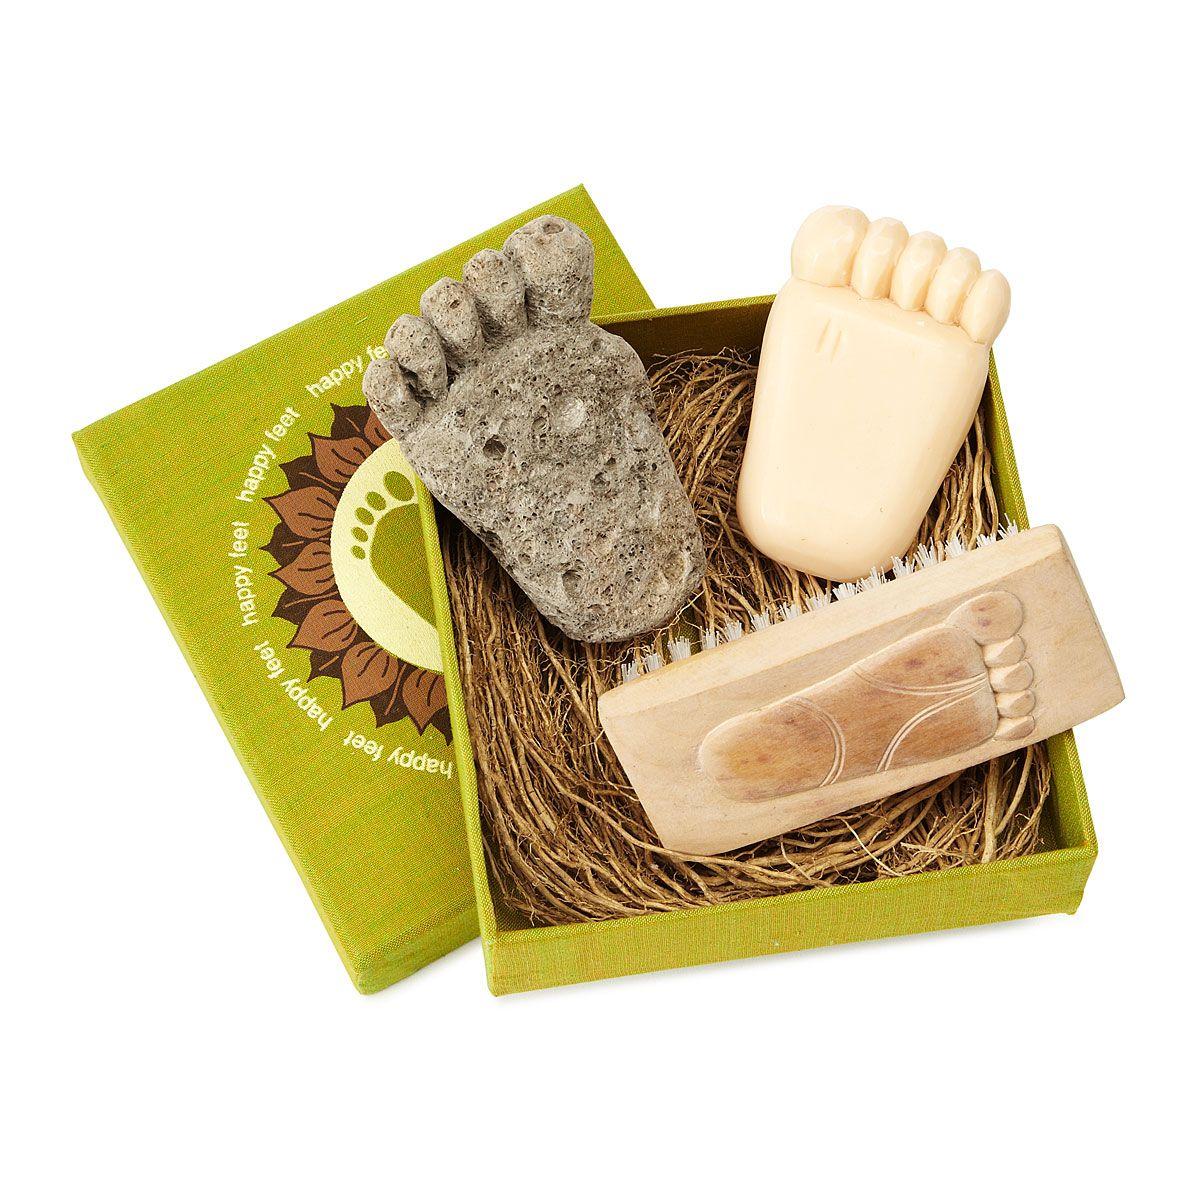 Happy Feet Spa Set   Spa, Pumice stone and Pumice